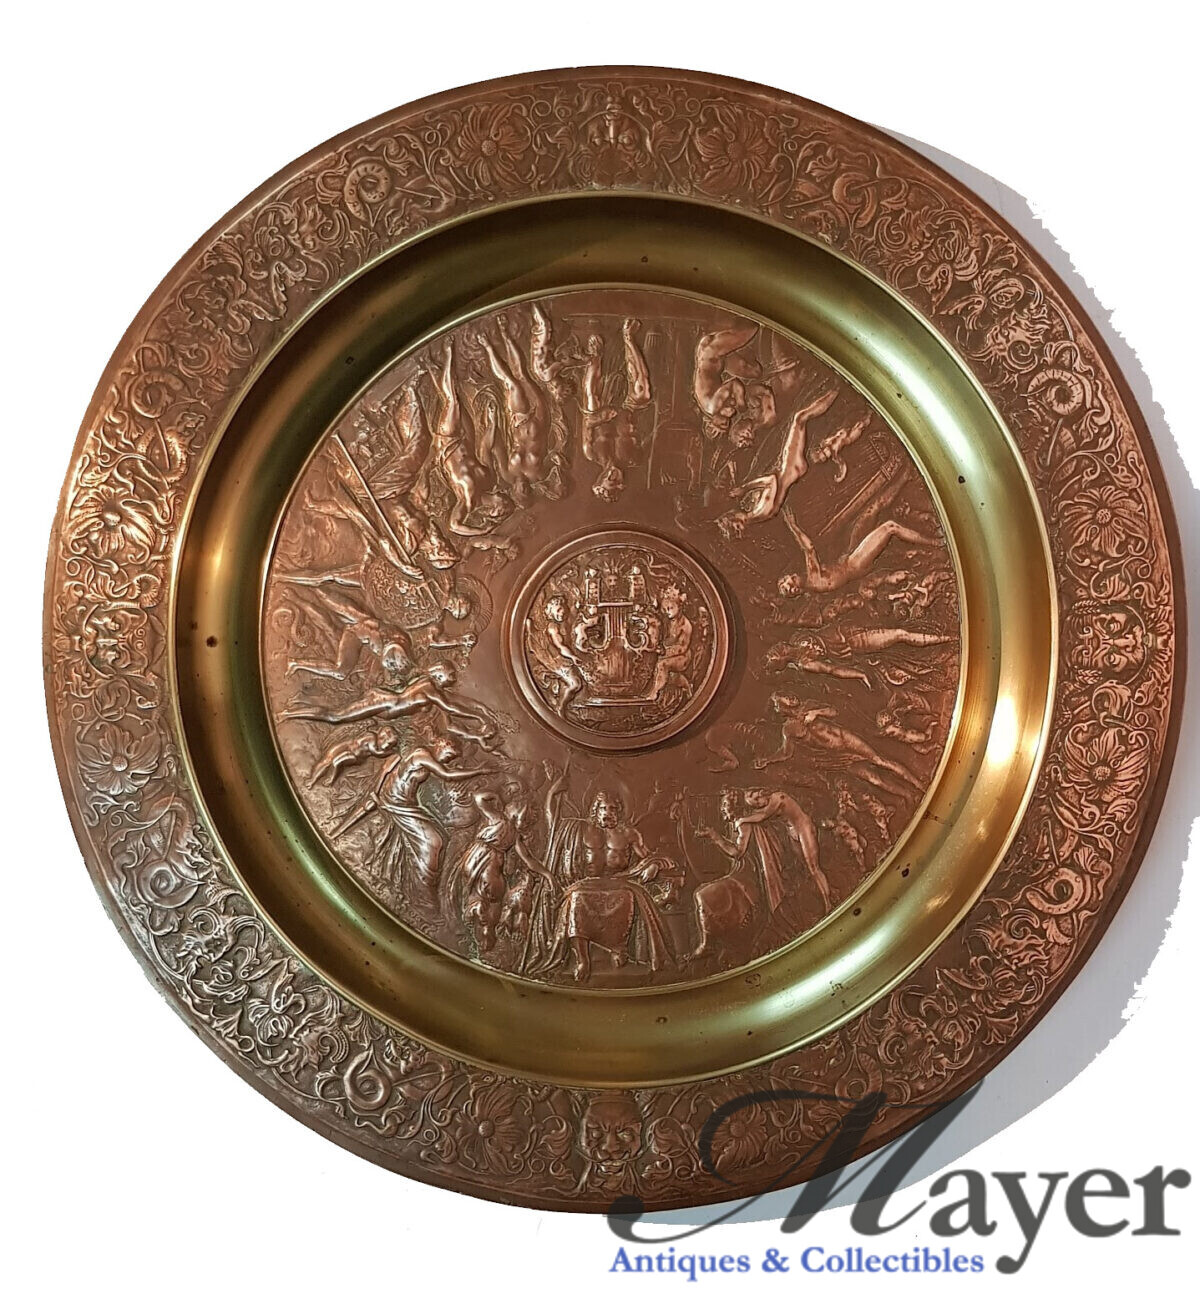 Greek Mythology Copper Plate